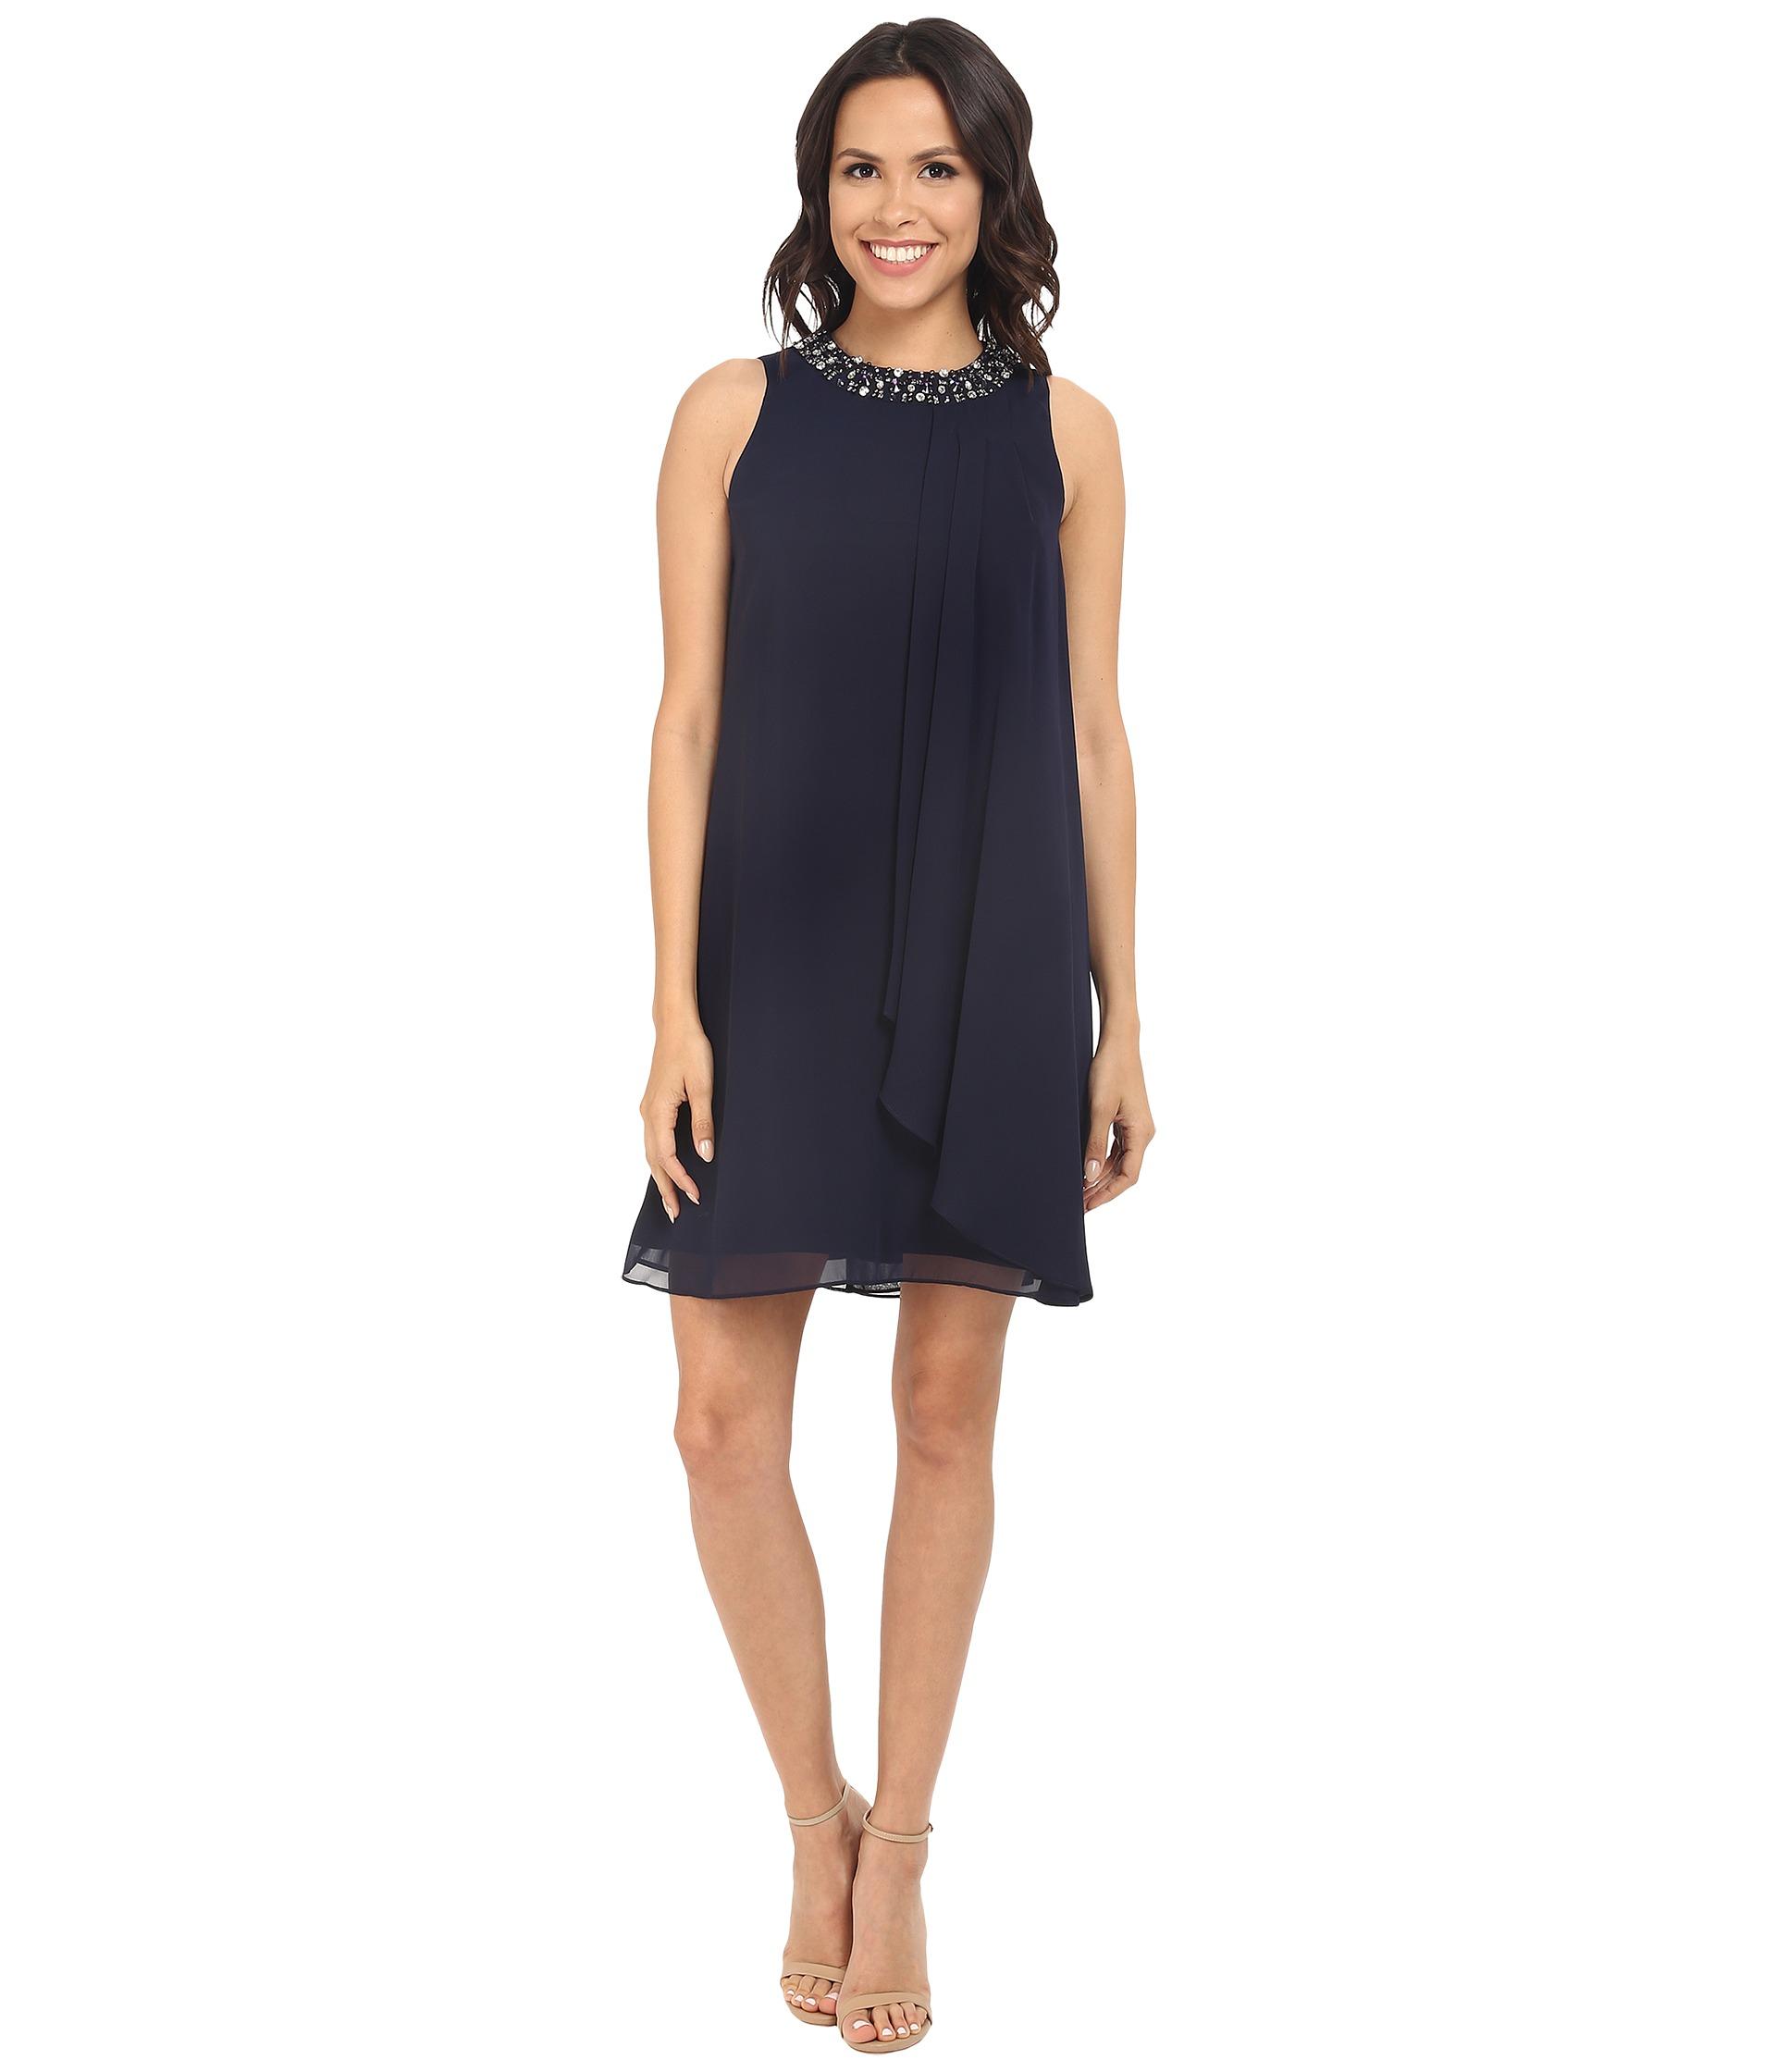 Cheap Best Wholesale Cheap Price single sleeve wrap dress - Black Reality Studio Wholesale Online u2m8SysgHT